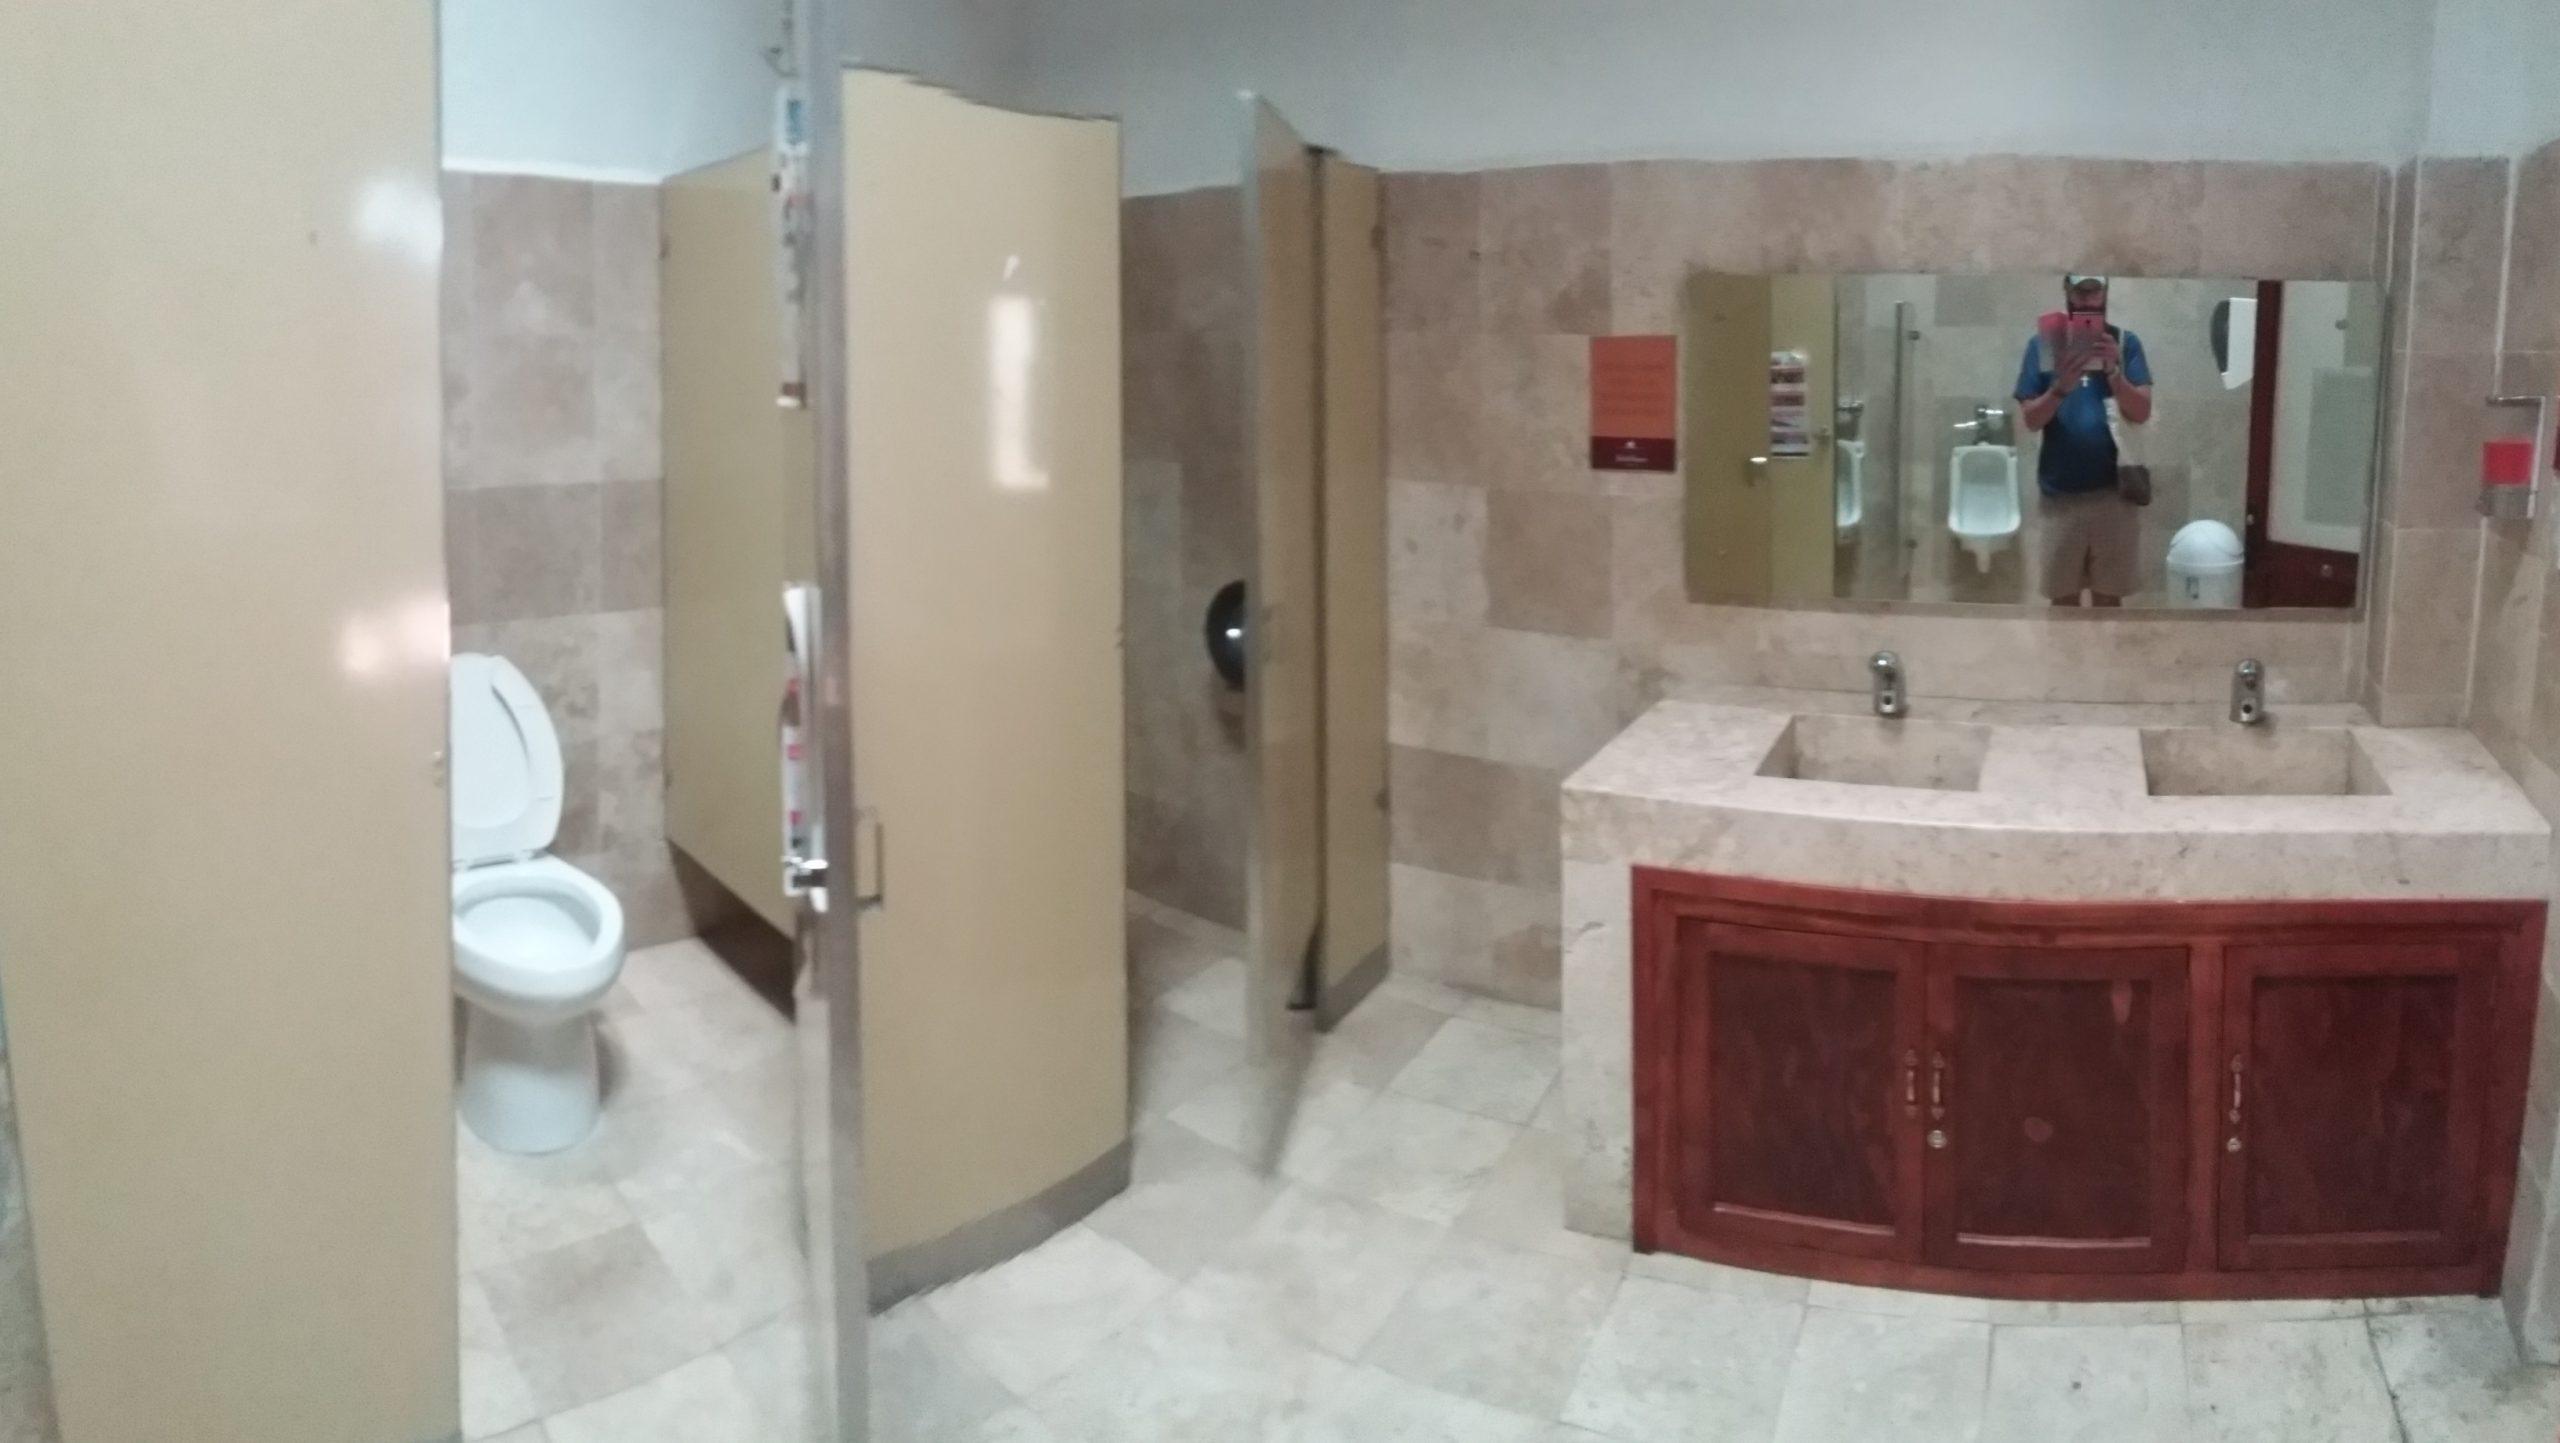 Toilette musée queretaro